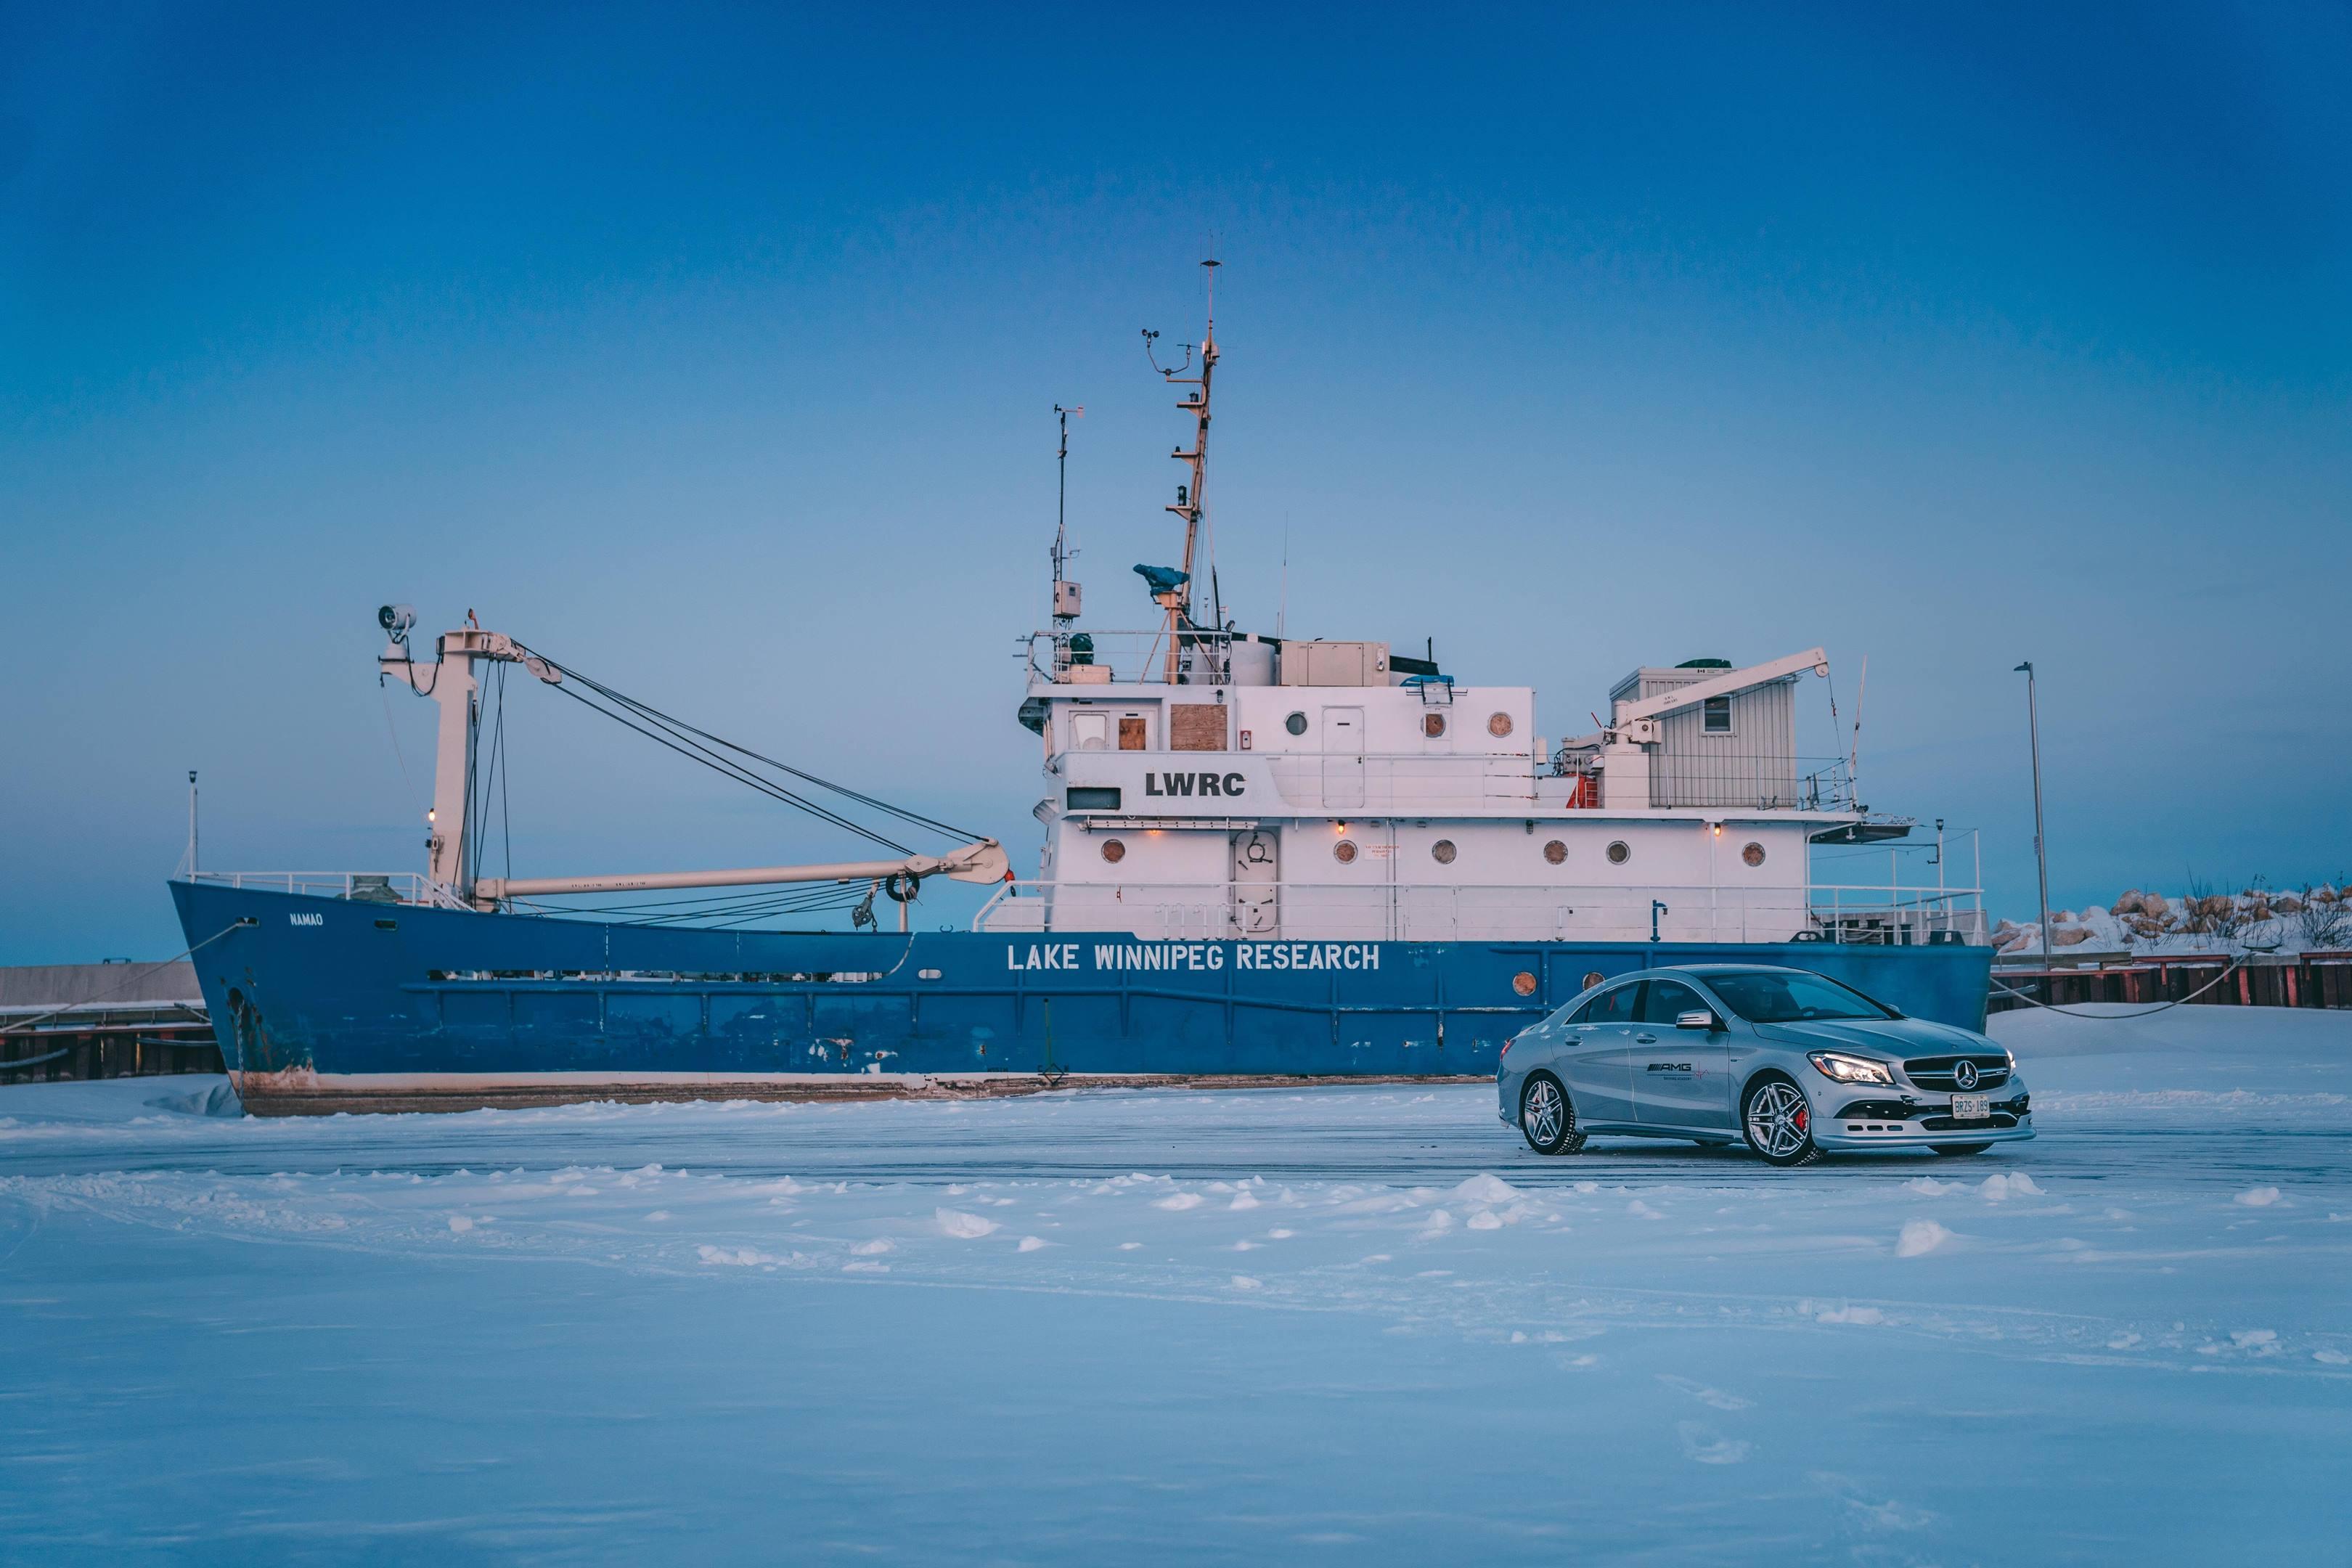 Mercedes-Benz driving school on a frozen lake